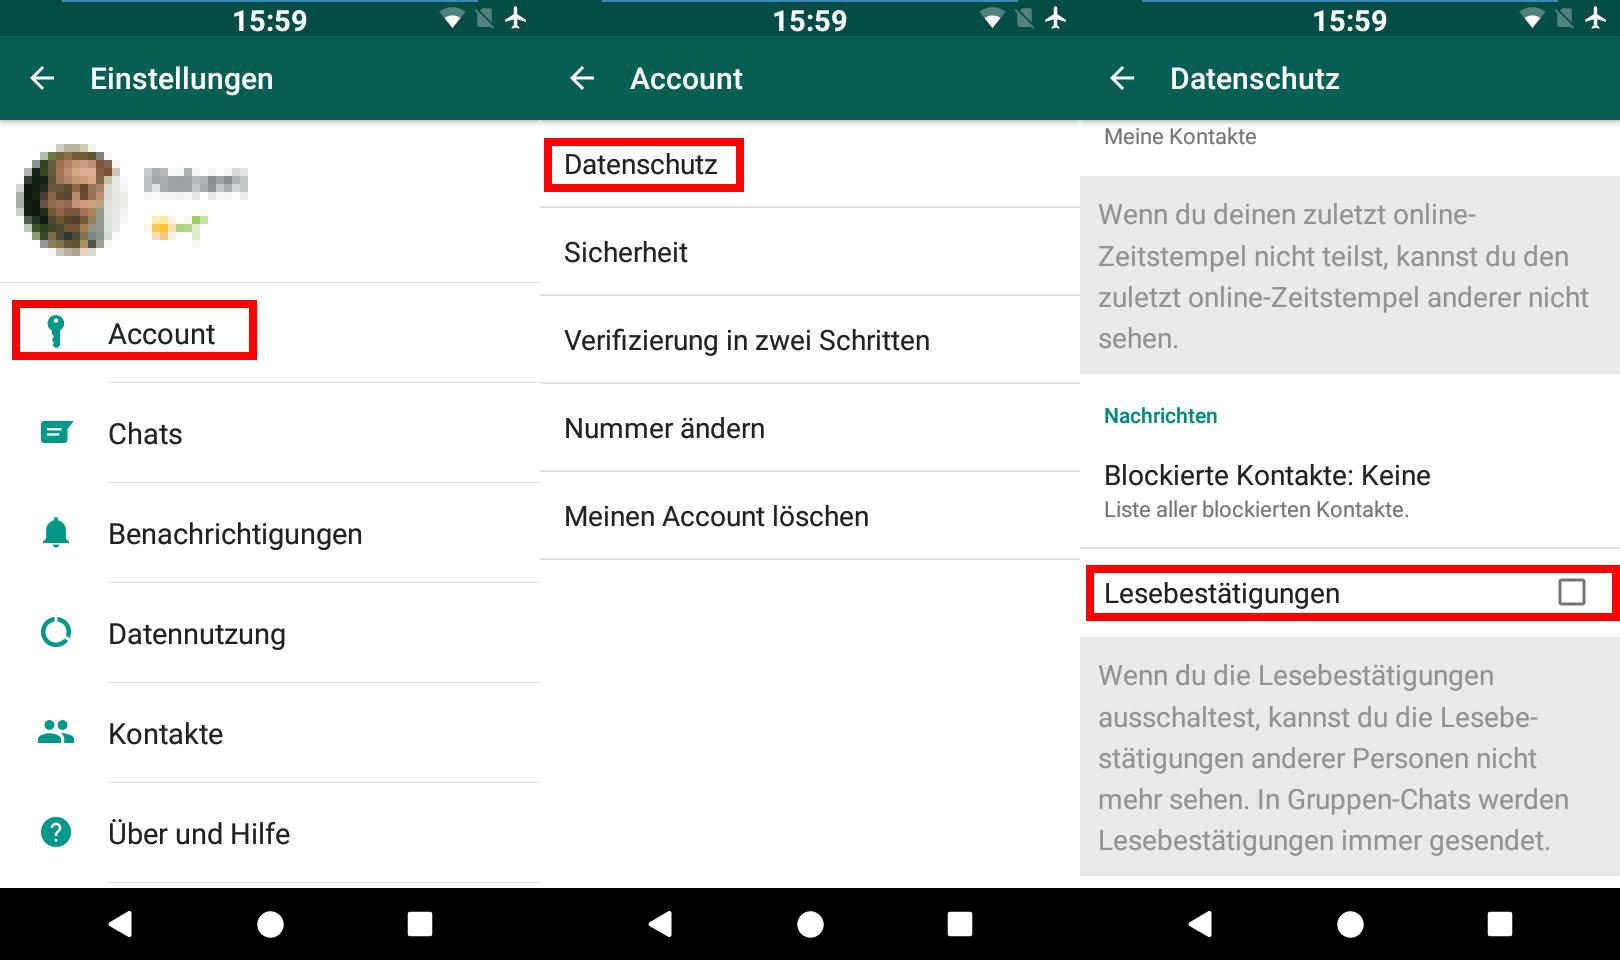 Whatsapp benachrichtigung wenn jemand online geht iphone